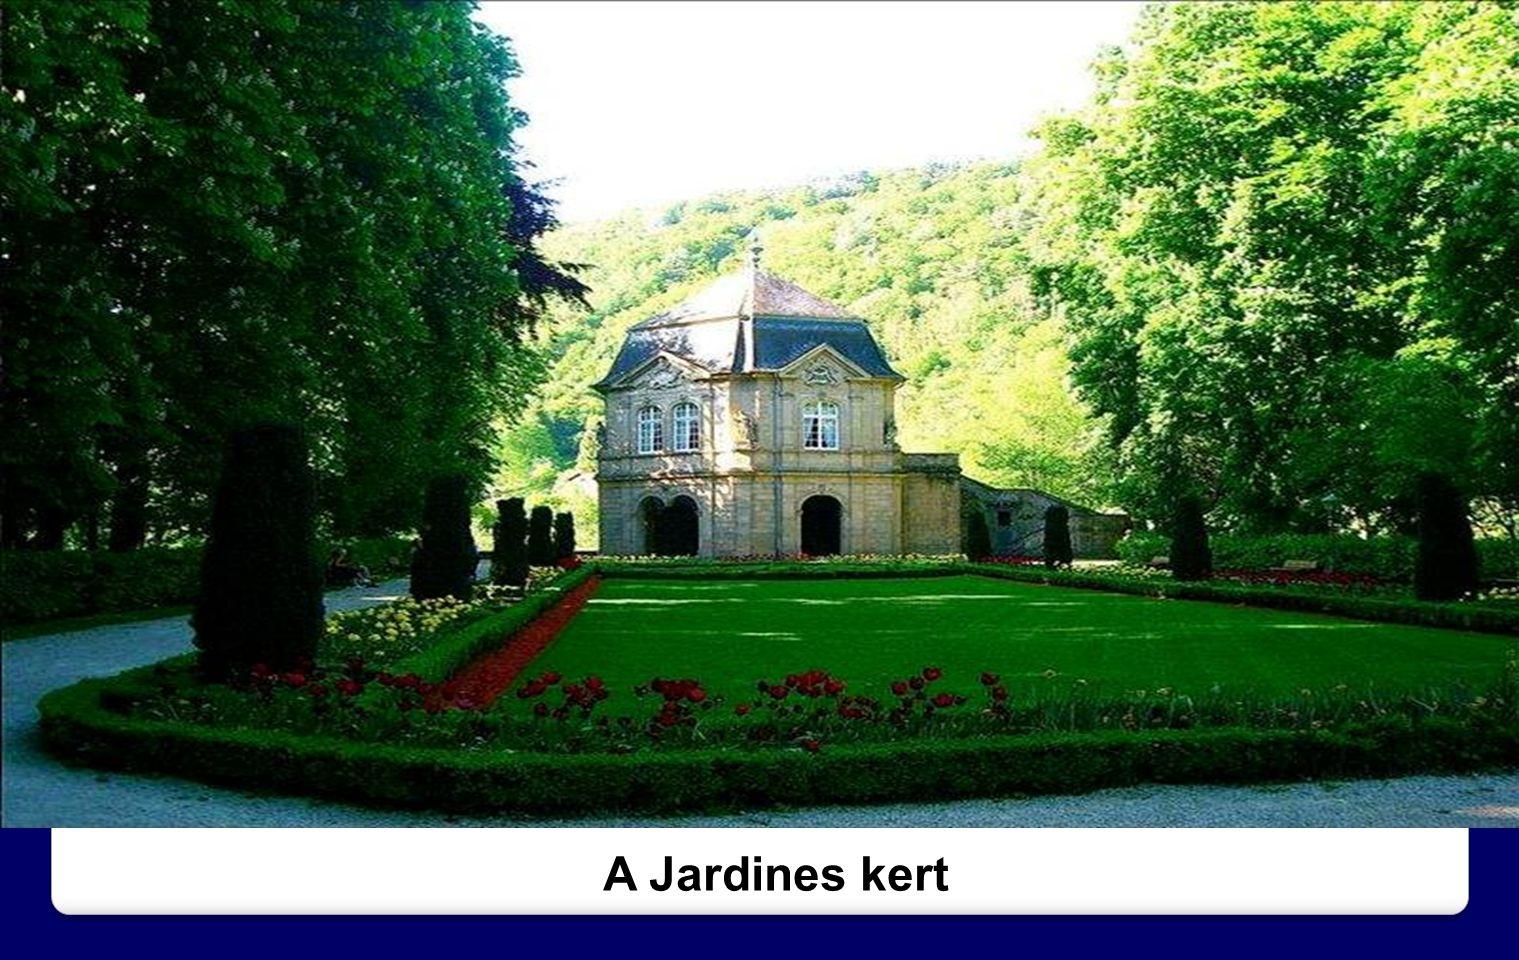 A Jardines kert